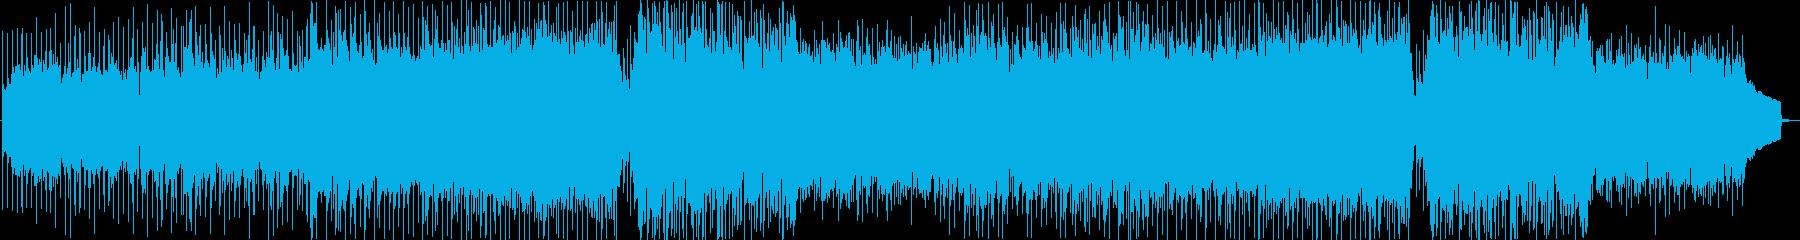 Cherishの再生済みの波形